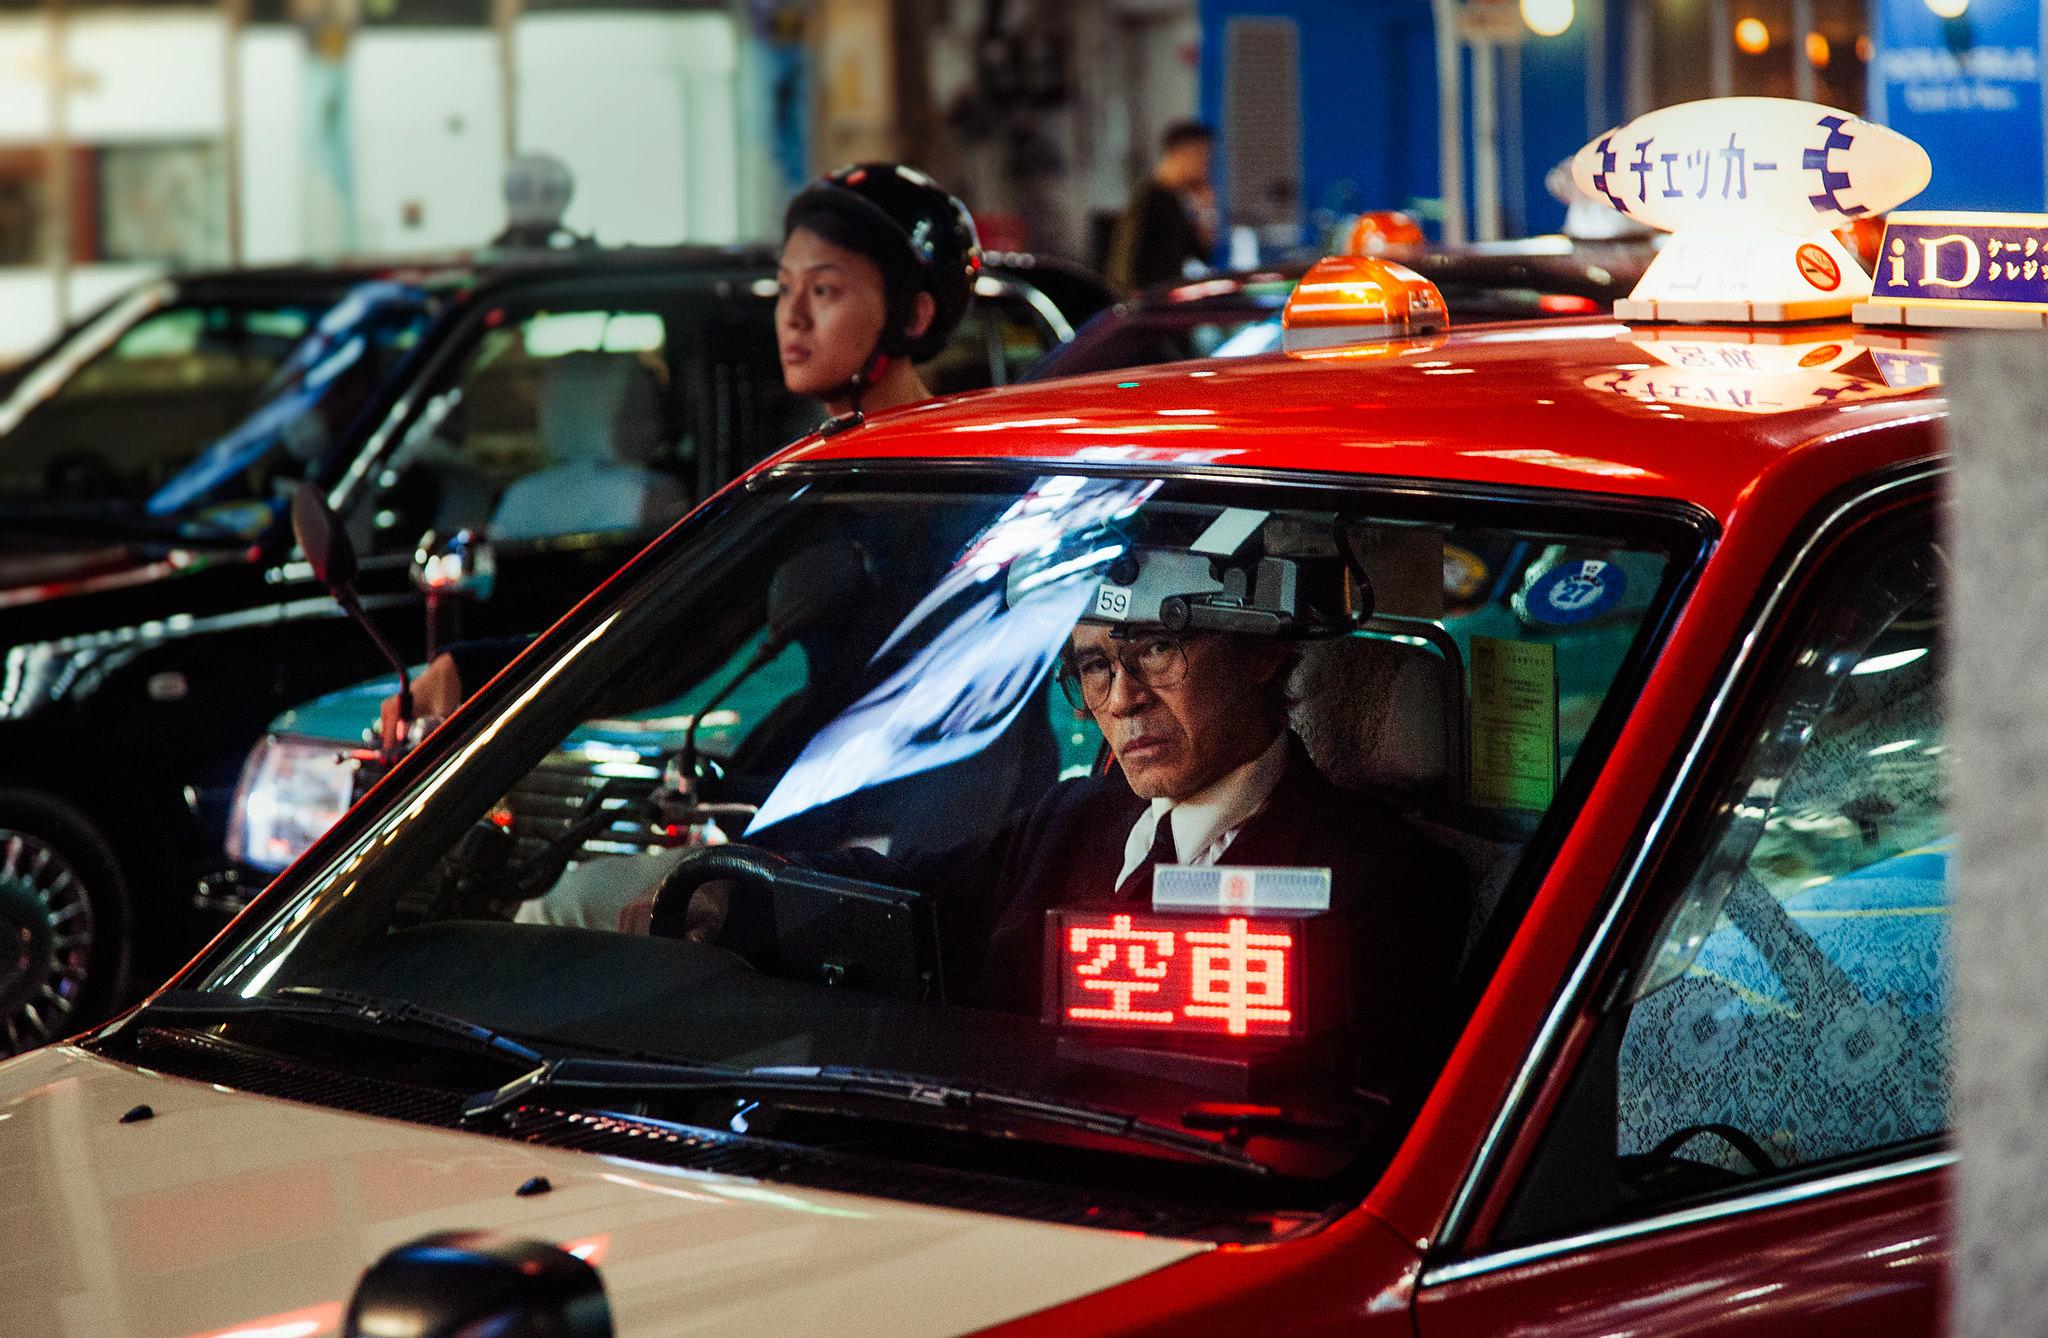 Shibuya Cab Driver